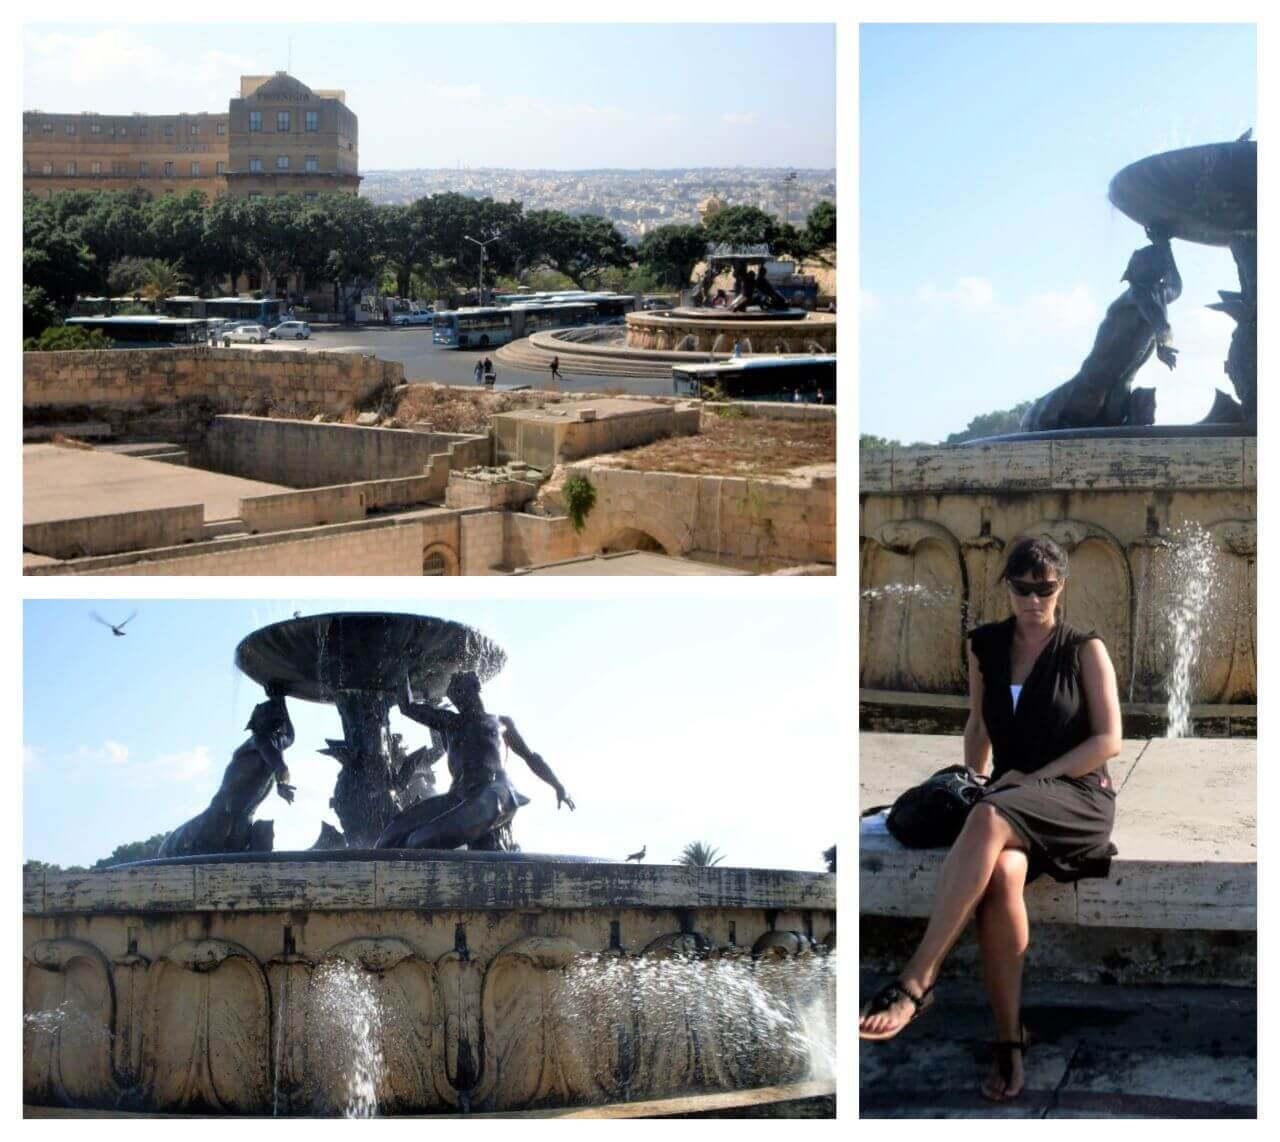 Triton fountain, Valetta, August 2012.